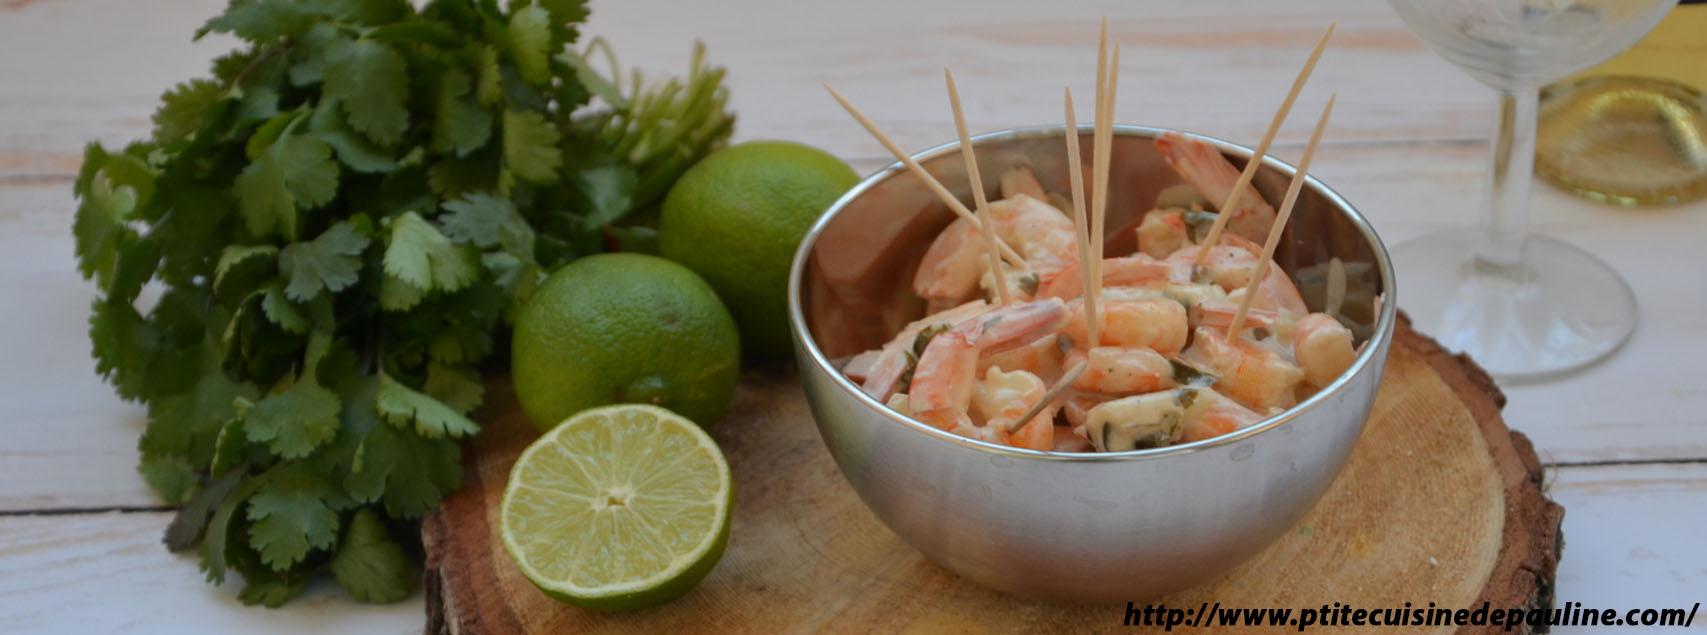 Crevettes citron vert, coco et coriandre